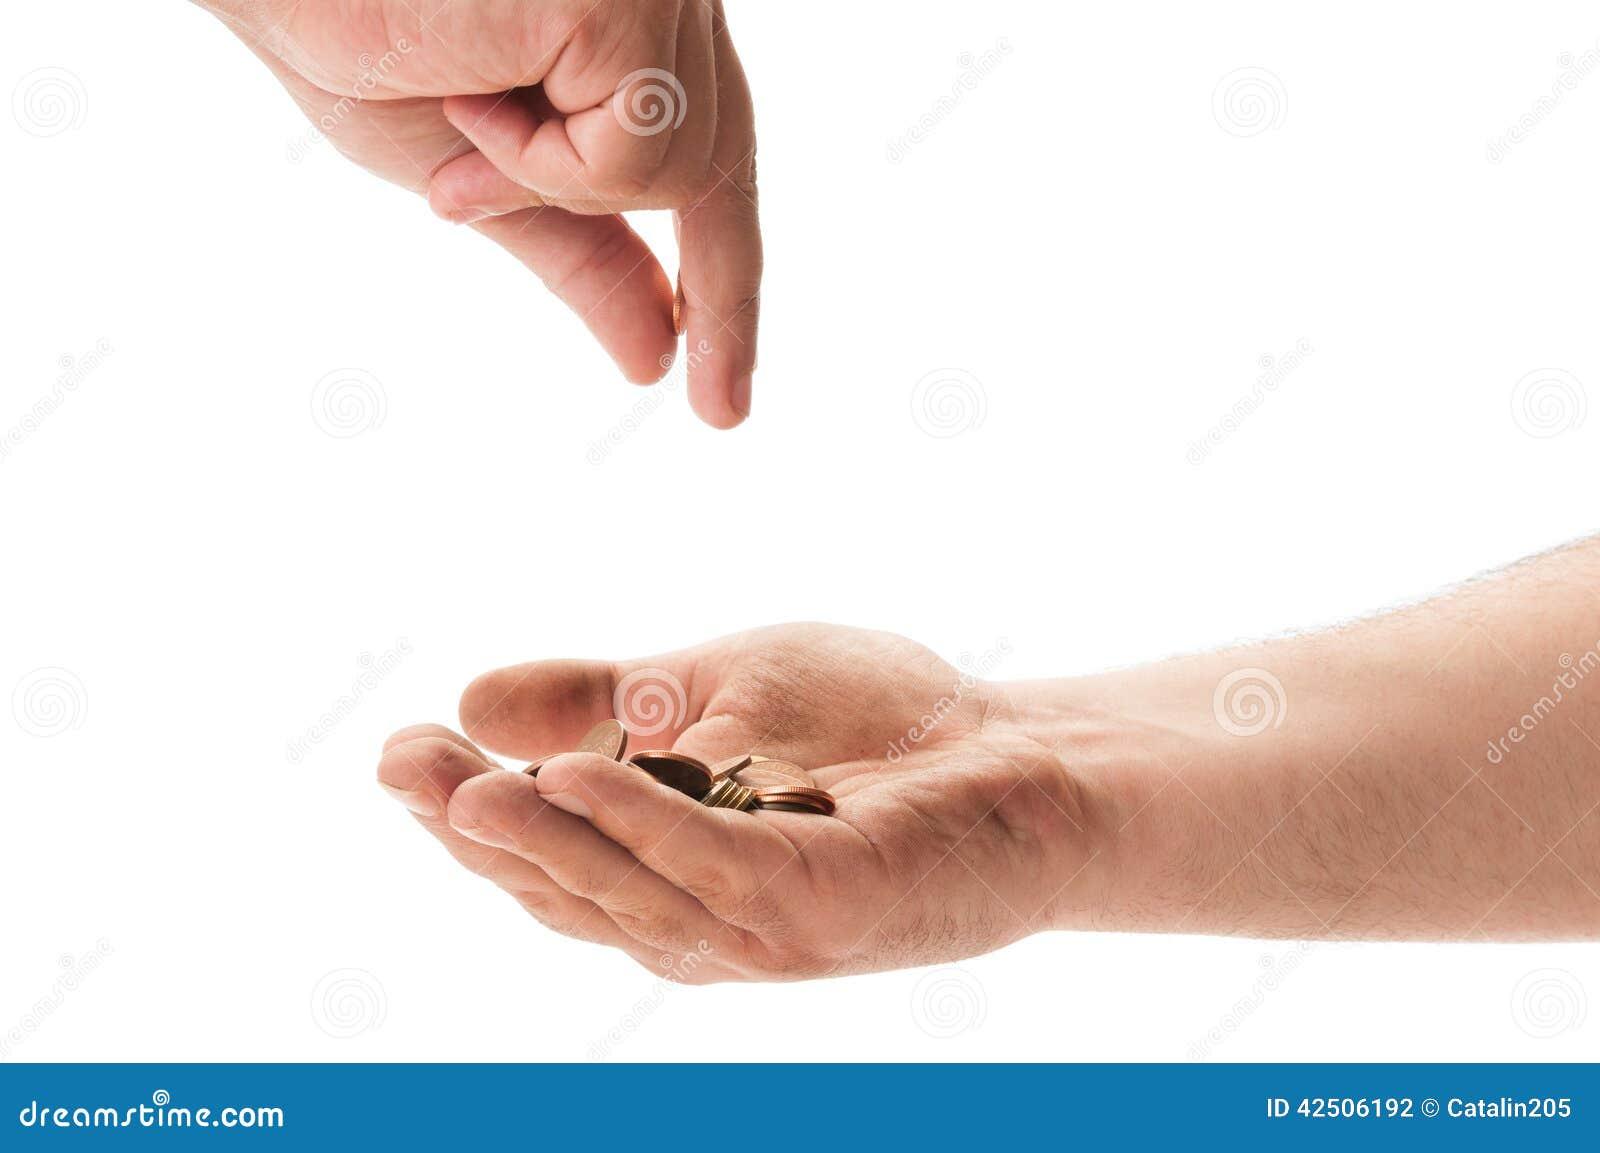 Beggar receiving coins stock photo. Image of begging ...  Beggar receivin...